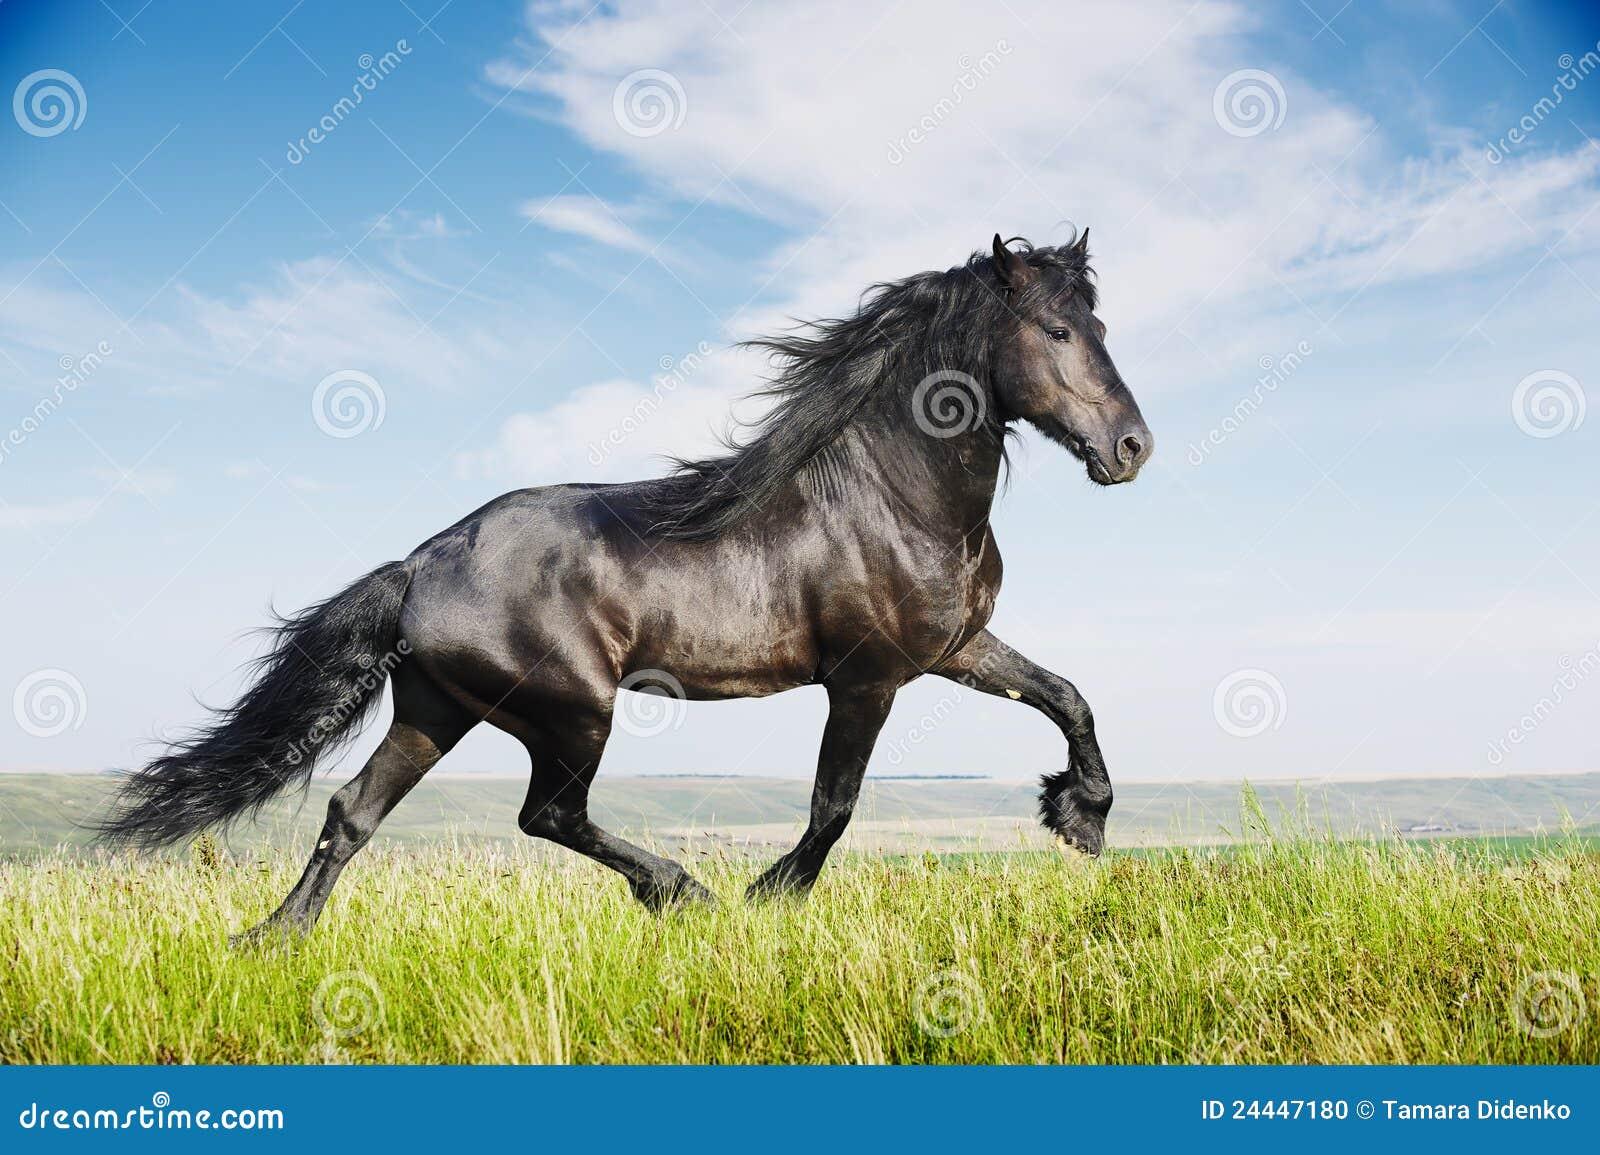 Beautiful black friesian stallion running trot on the field Images Of Black Horses Running